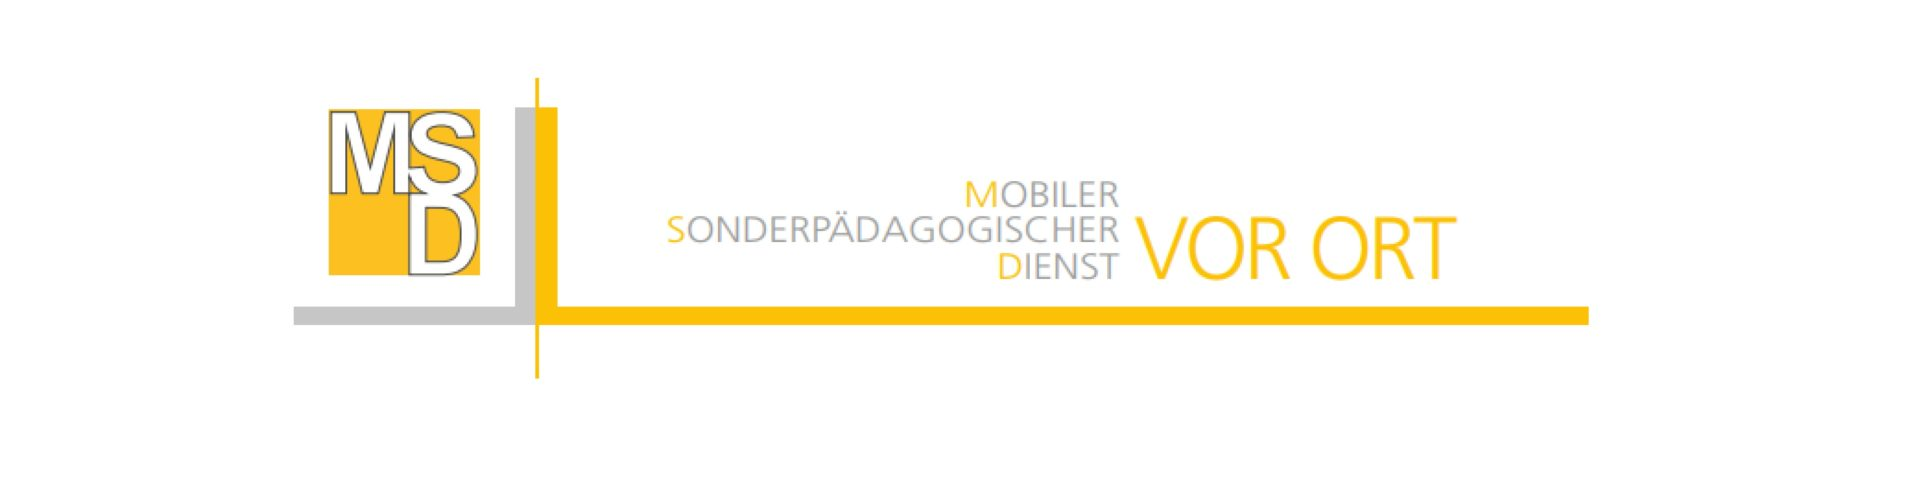 Mobiler Sonderpädagogischer Dienst